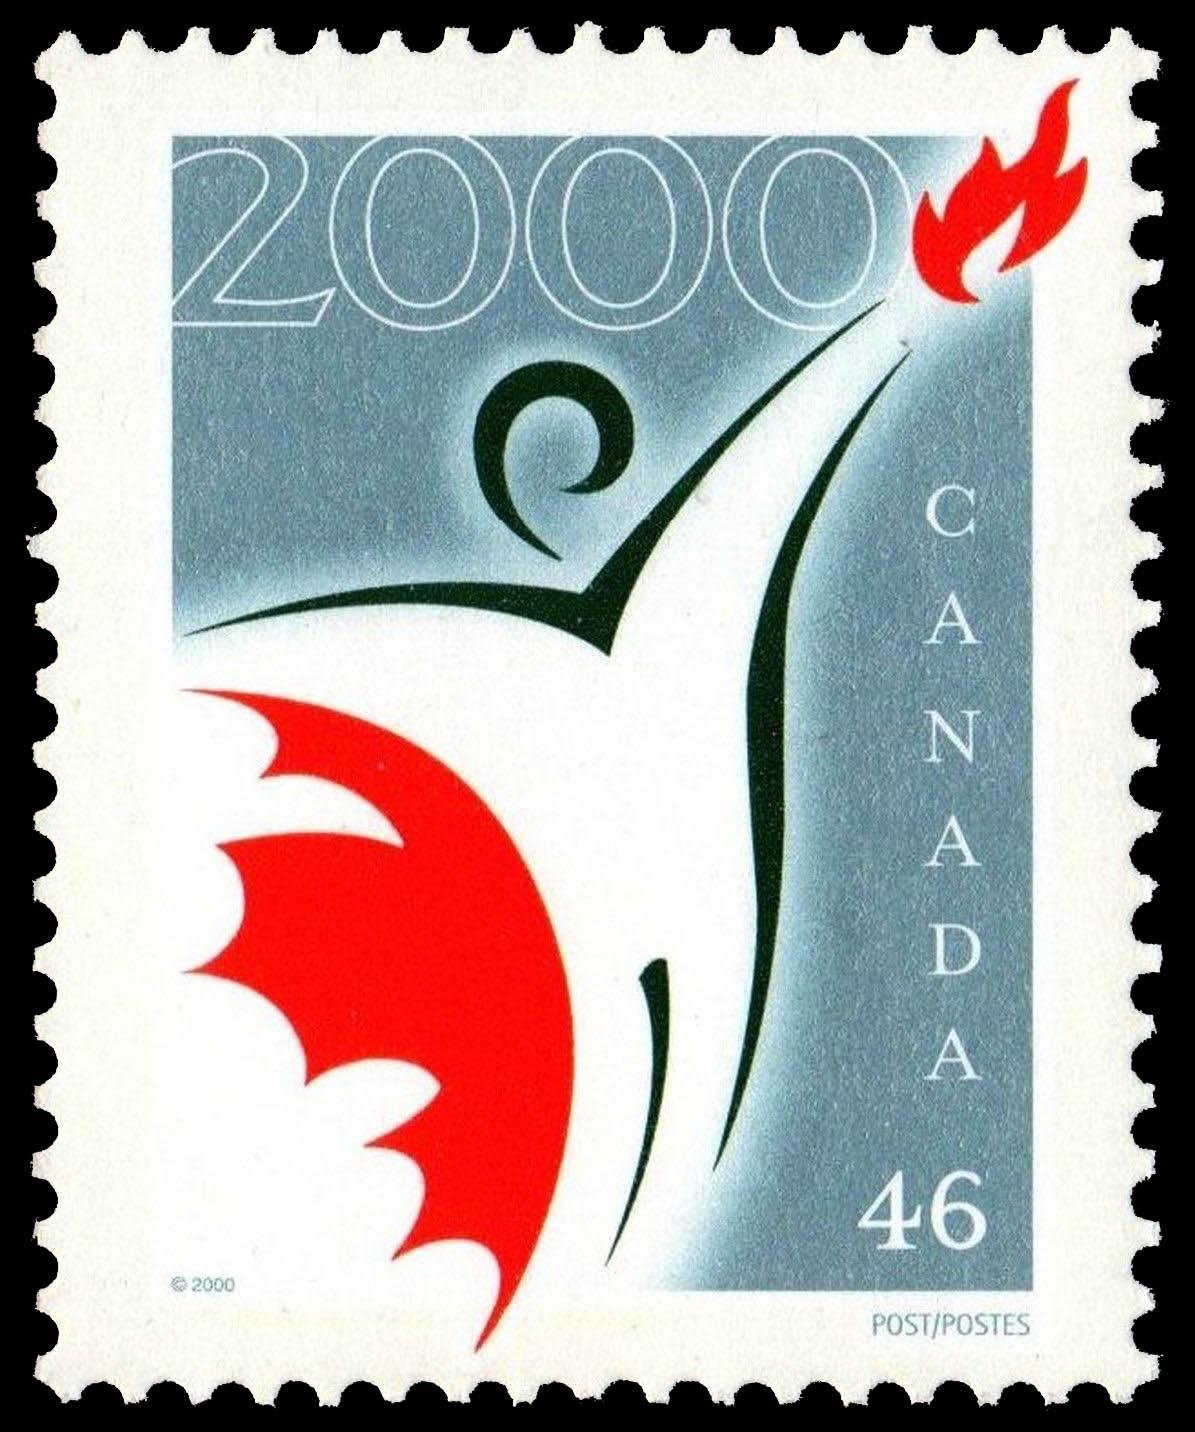 Canada Millennium Partnership Program Canada Postage Stamp